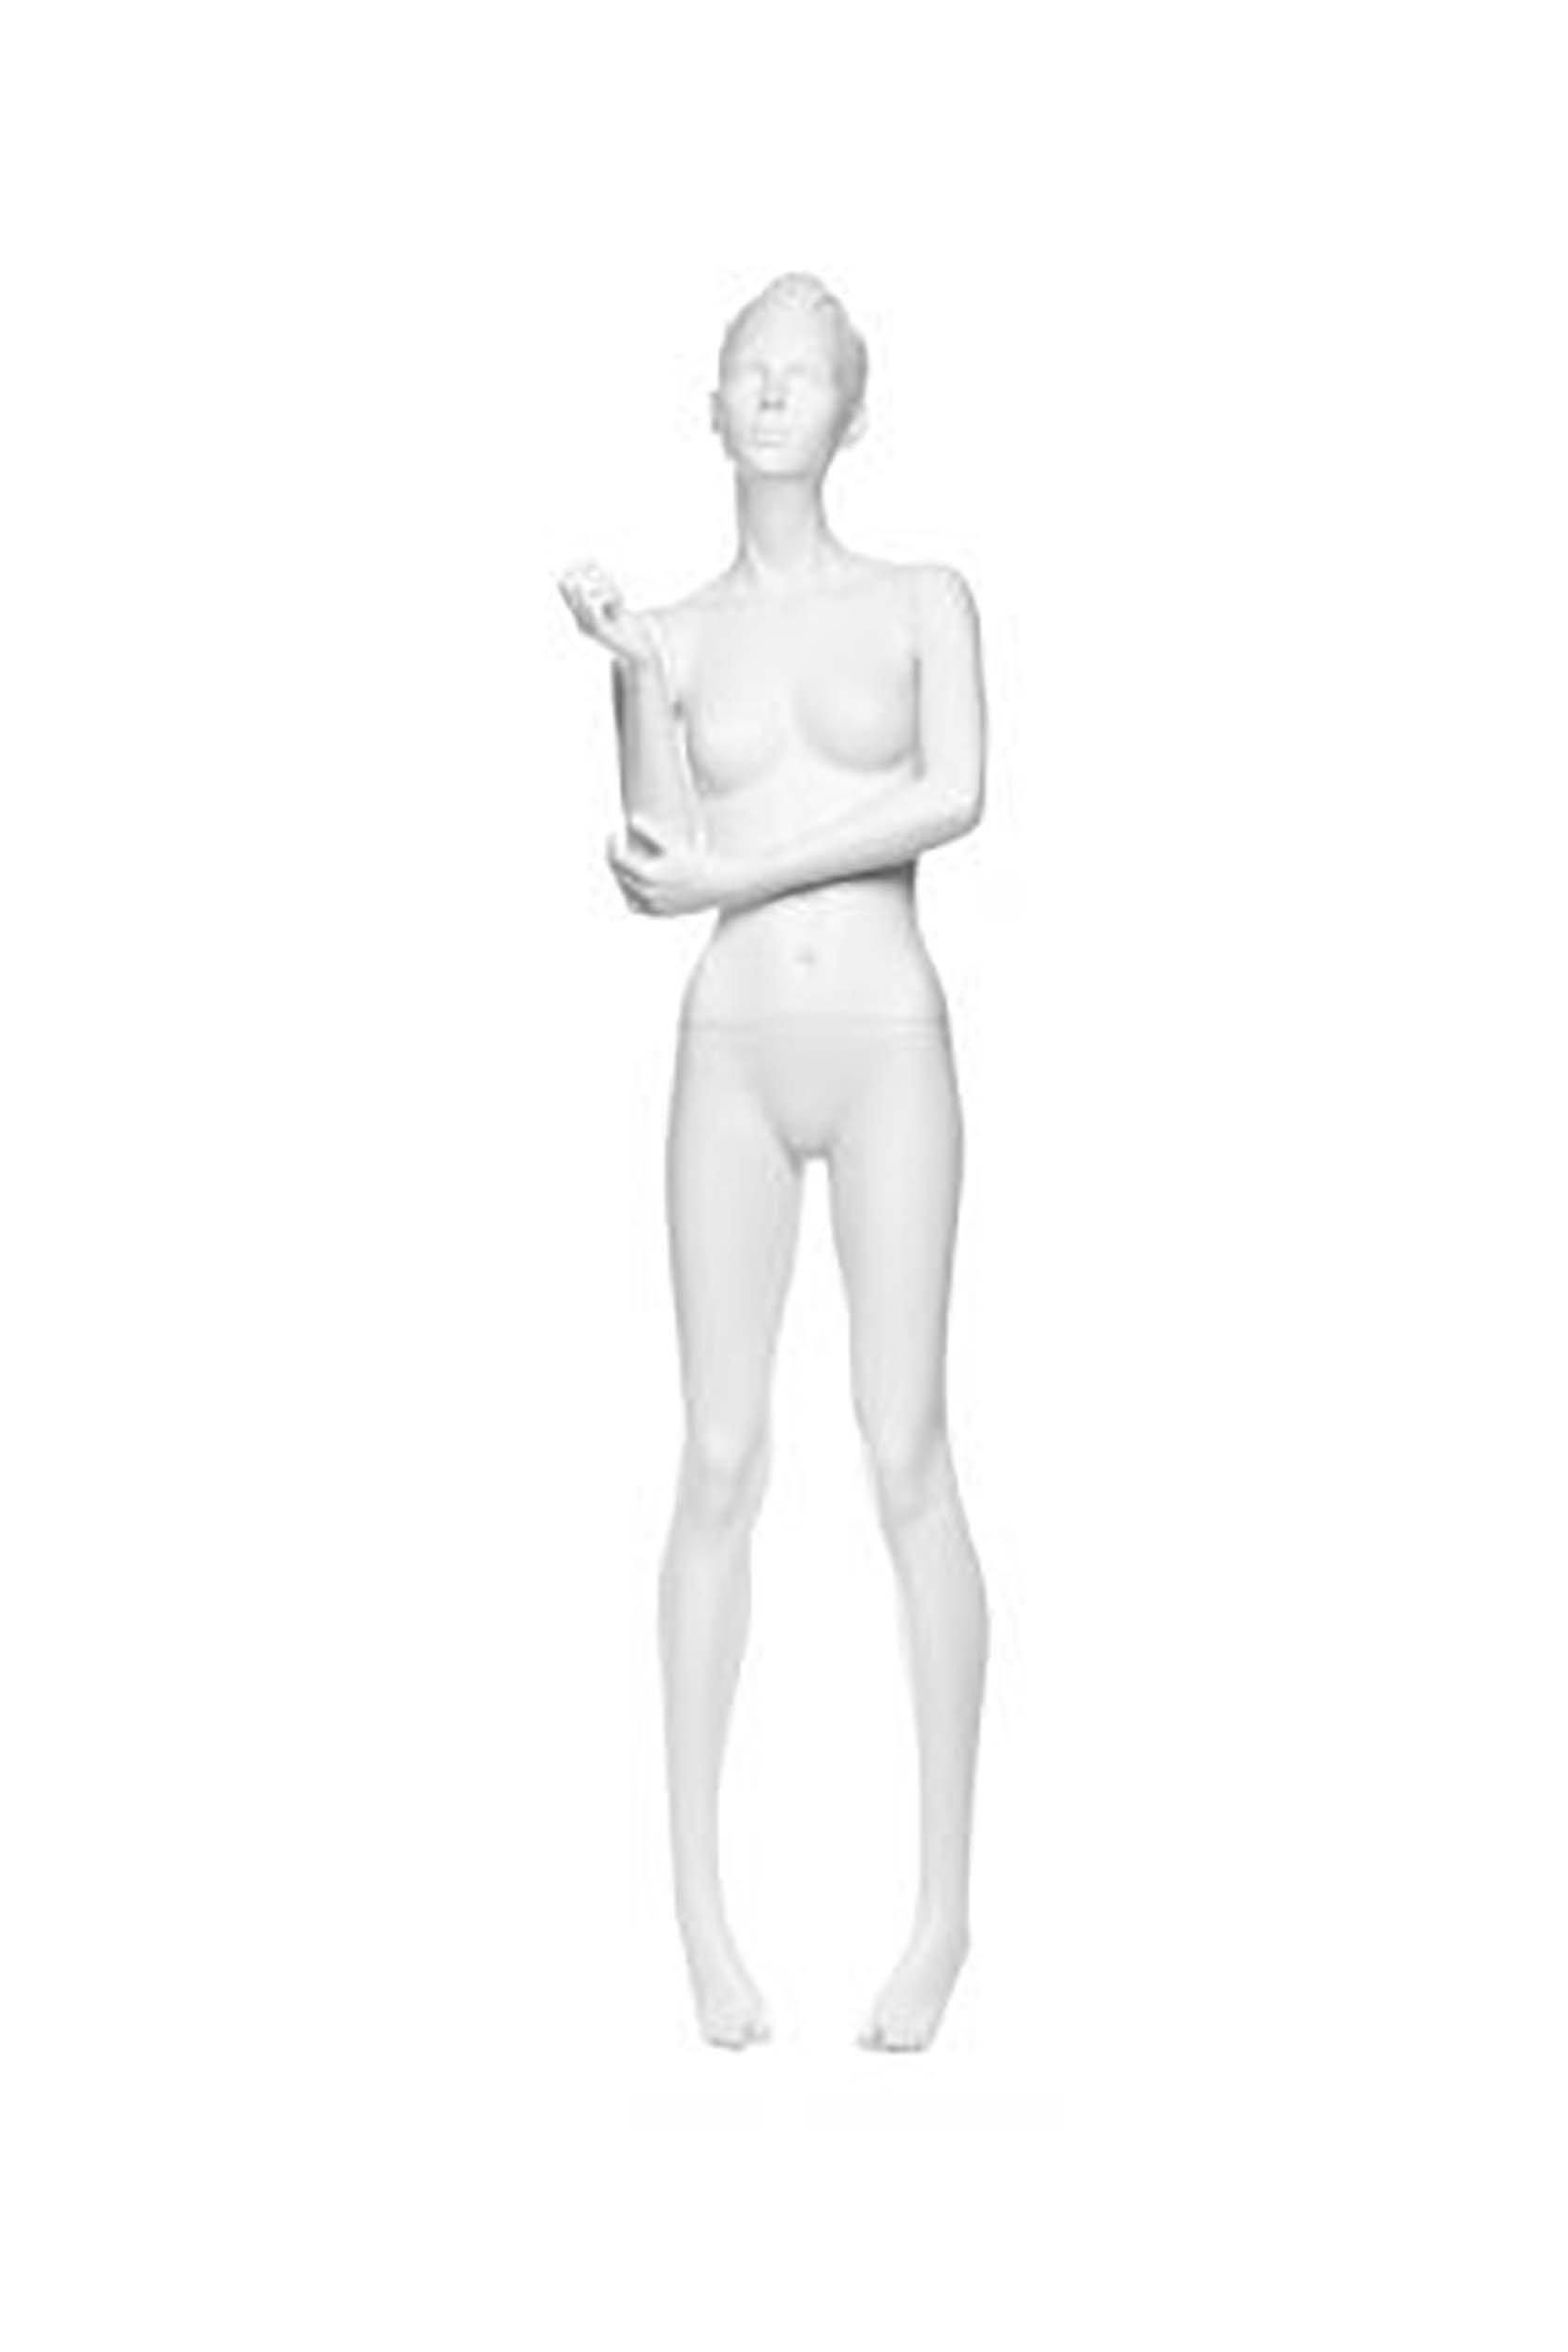 1672x2508 Sx New Generation Female Mannequin Pos. 07